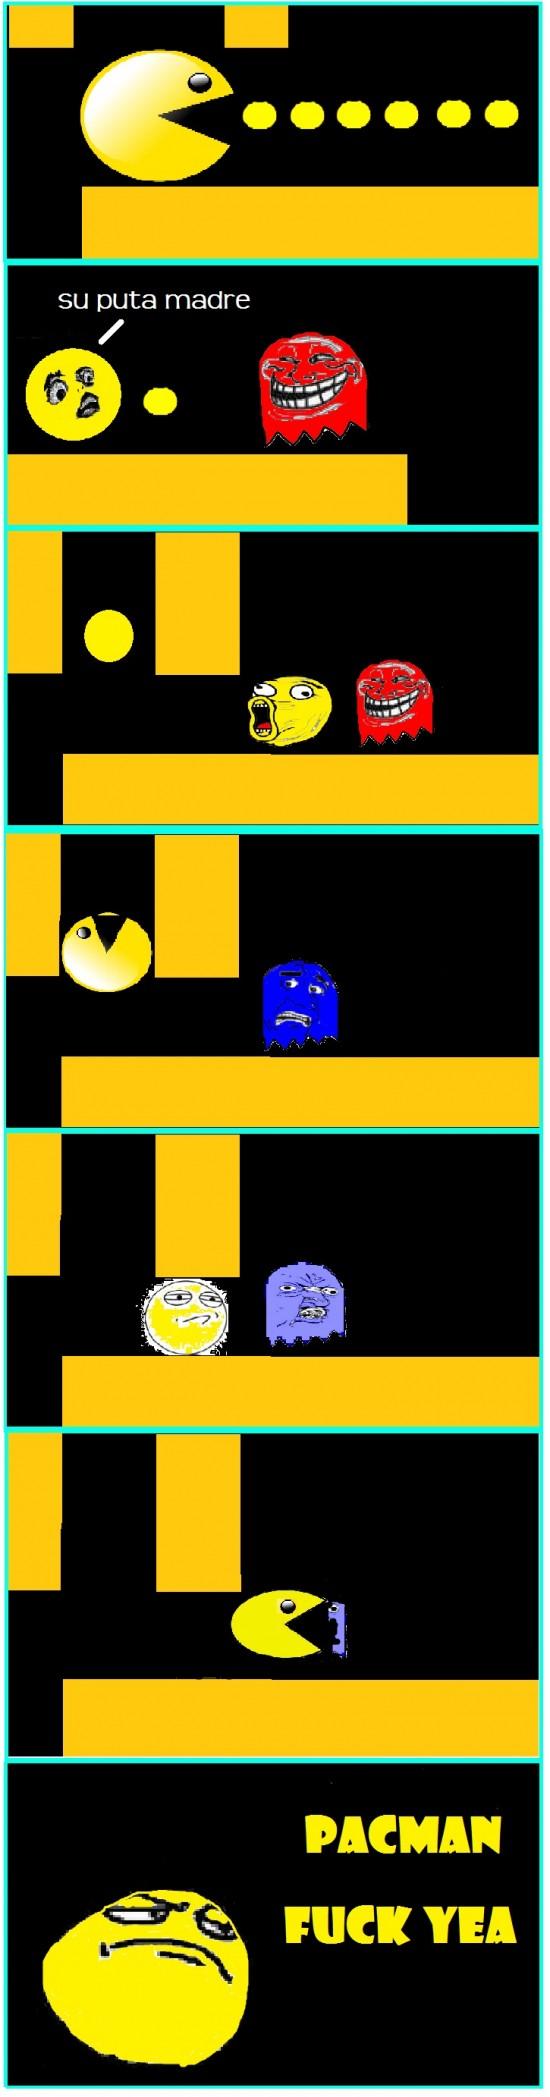 Fuck_yea - Pacman Wins